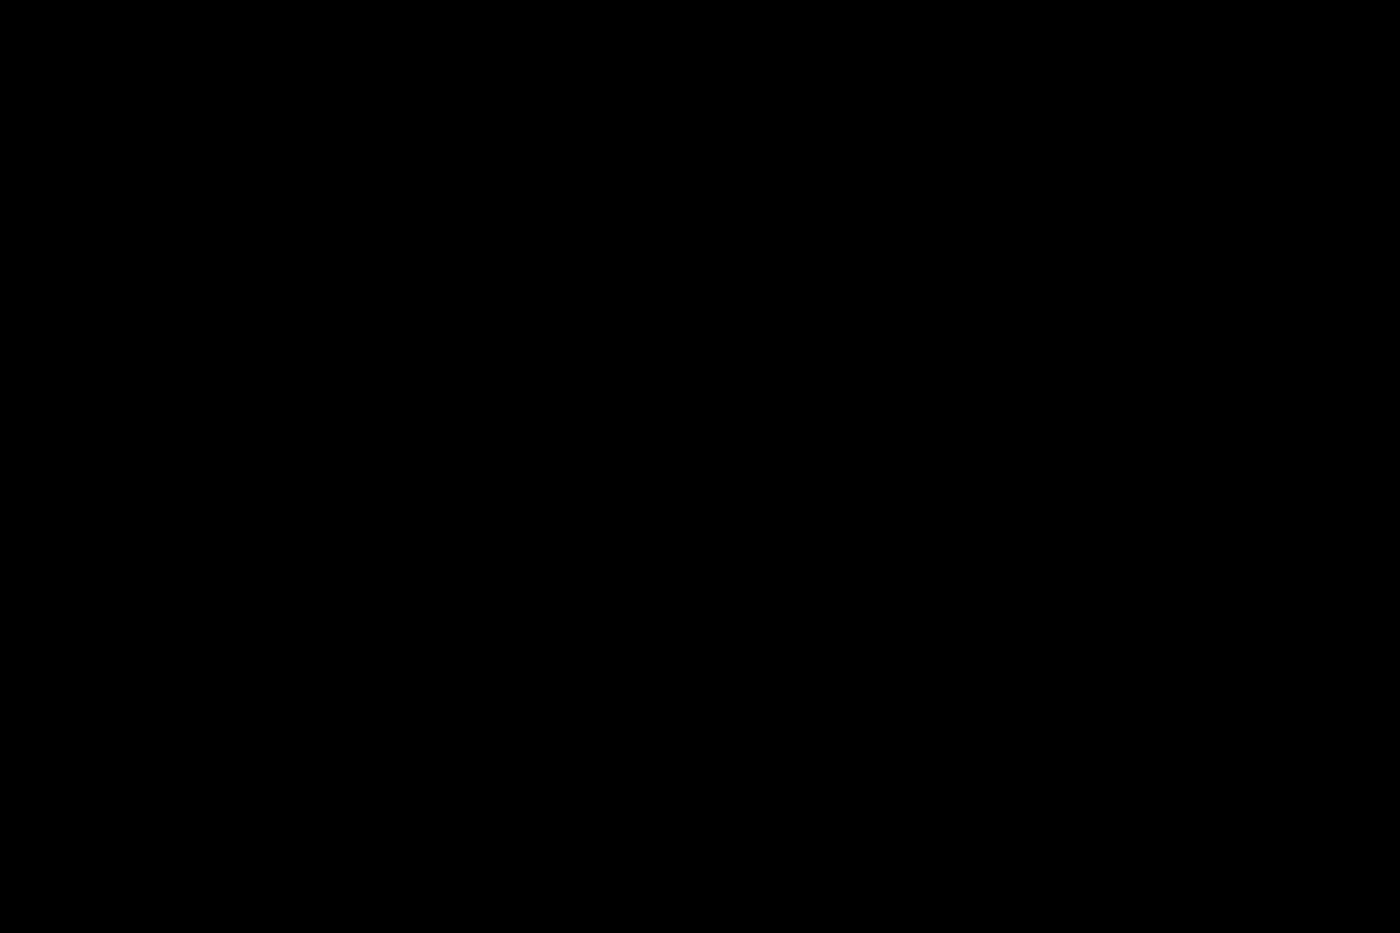 txt_2088_enbw_jp_bilsterberg_paulgaertner_web